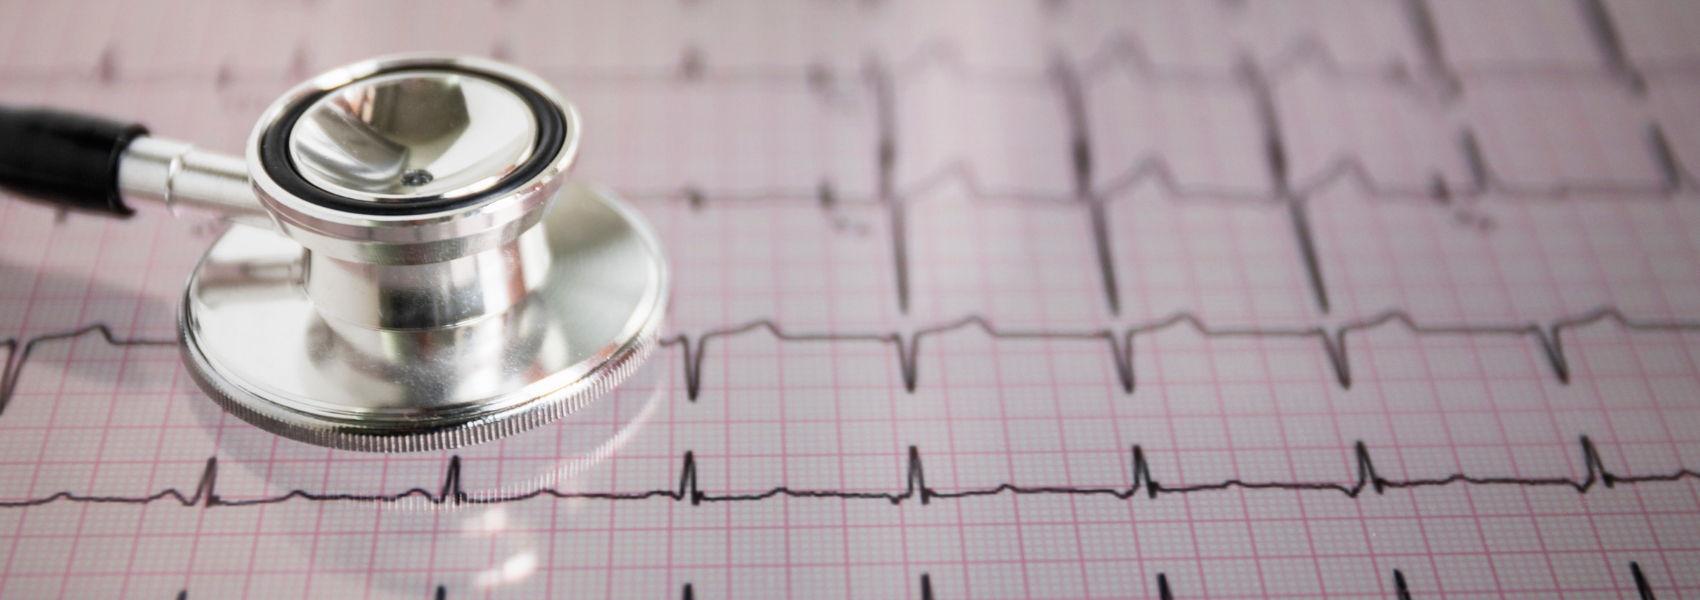 novo pacemaker